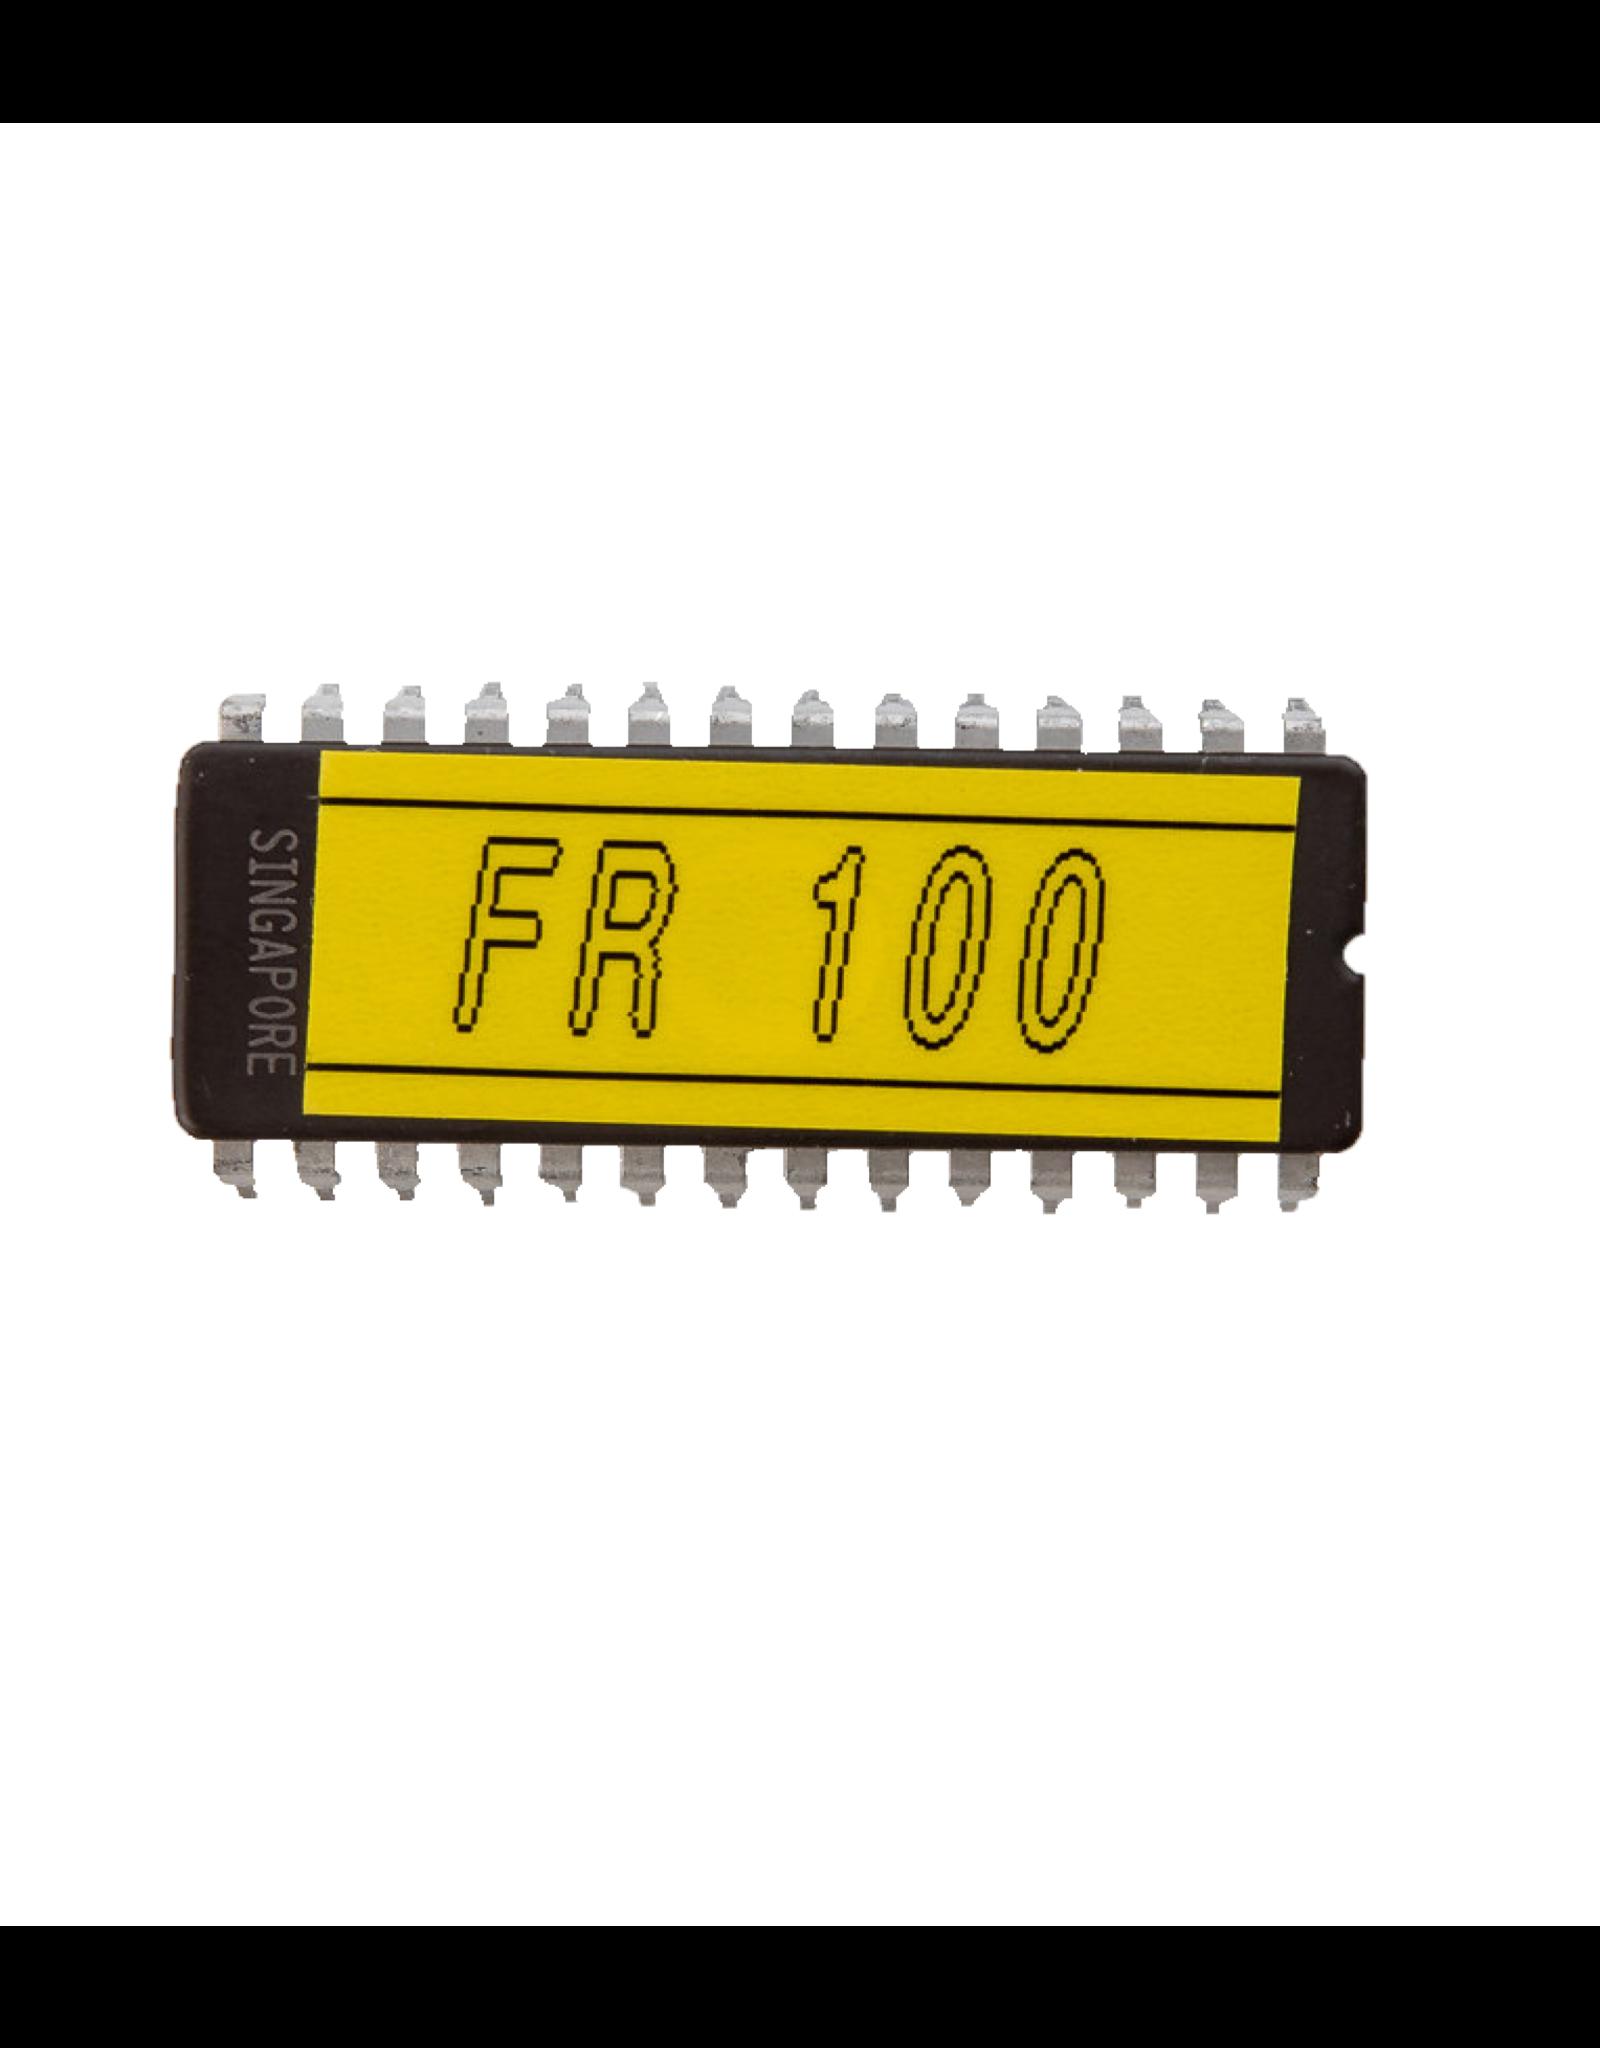 Eprom FR100 Performance Chip (see Description)